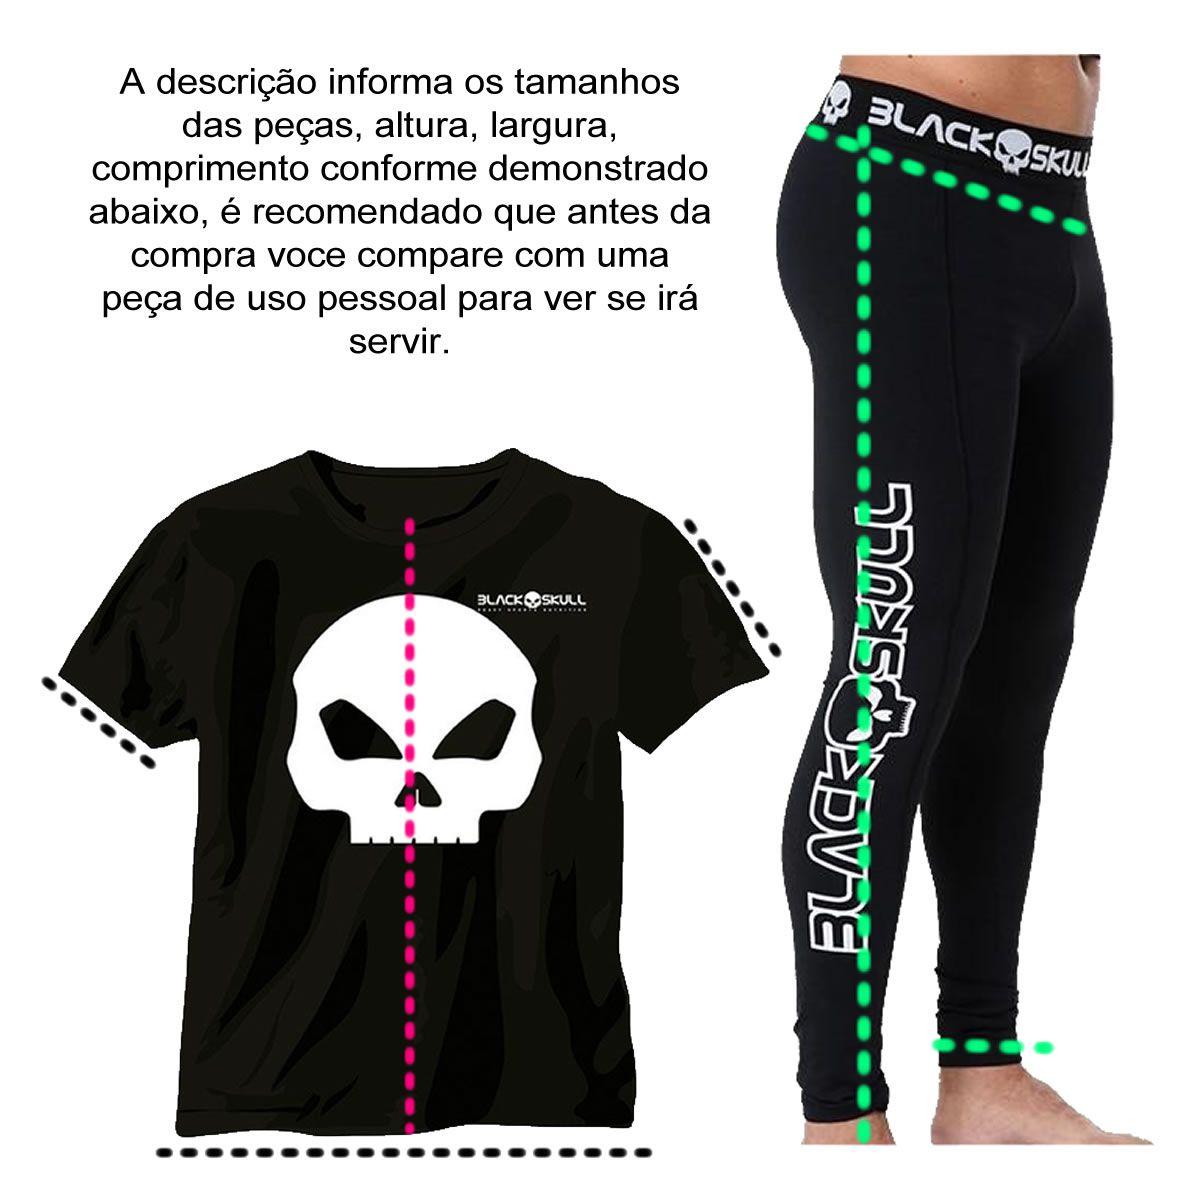 Camiseta Reverse Preto - Black Skull